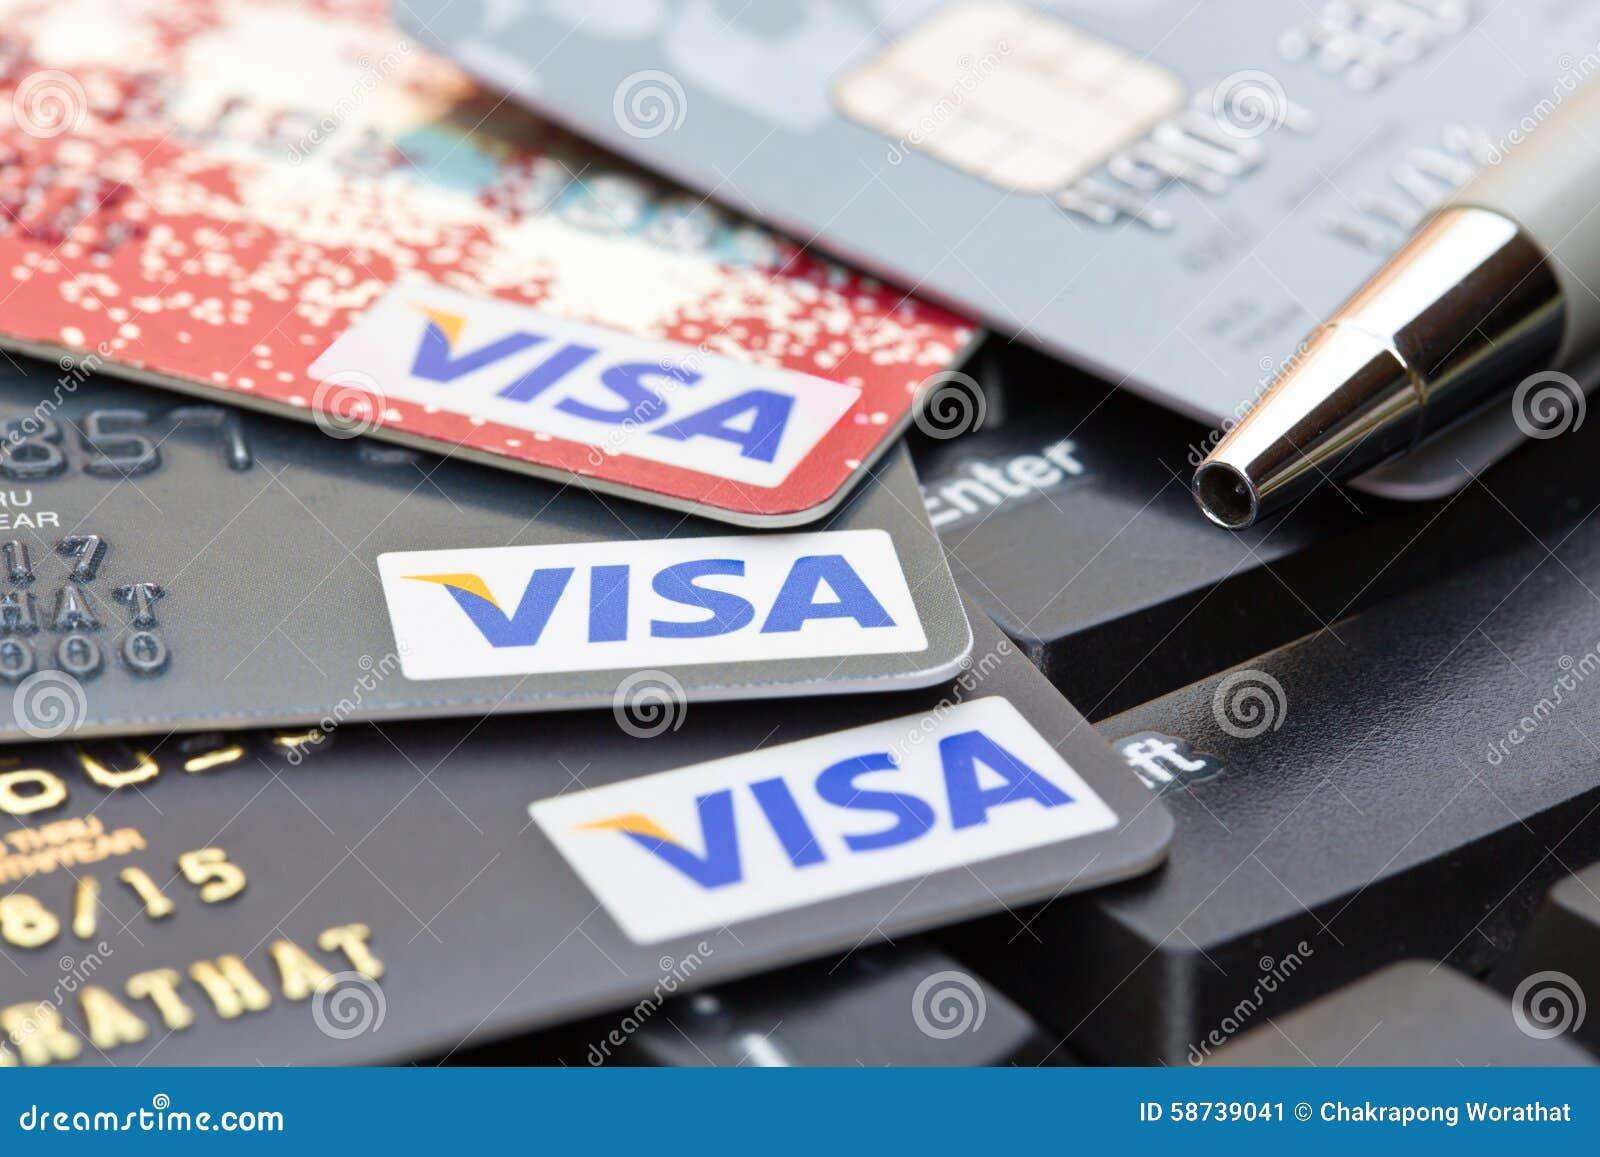 Nakhonratchasima thailand august 1 2015 credit card visa b nakhonratchasima thailand august 1 2015 credit card visa b editorial stock photo biocorpaavc Choice Image